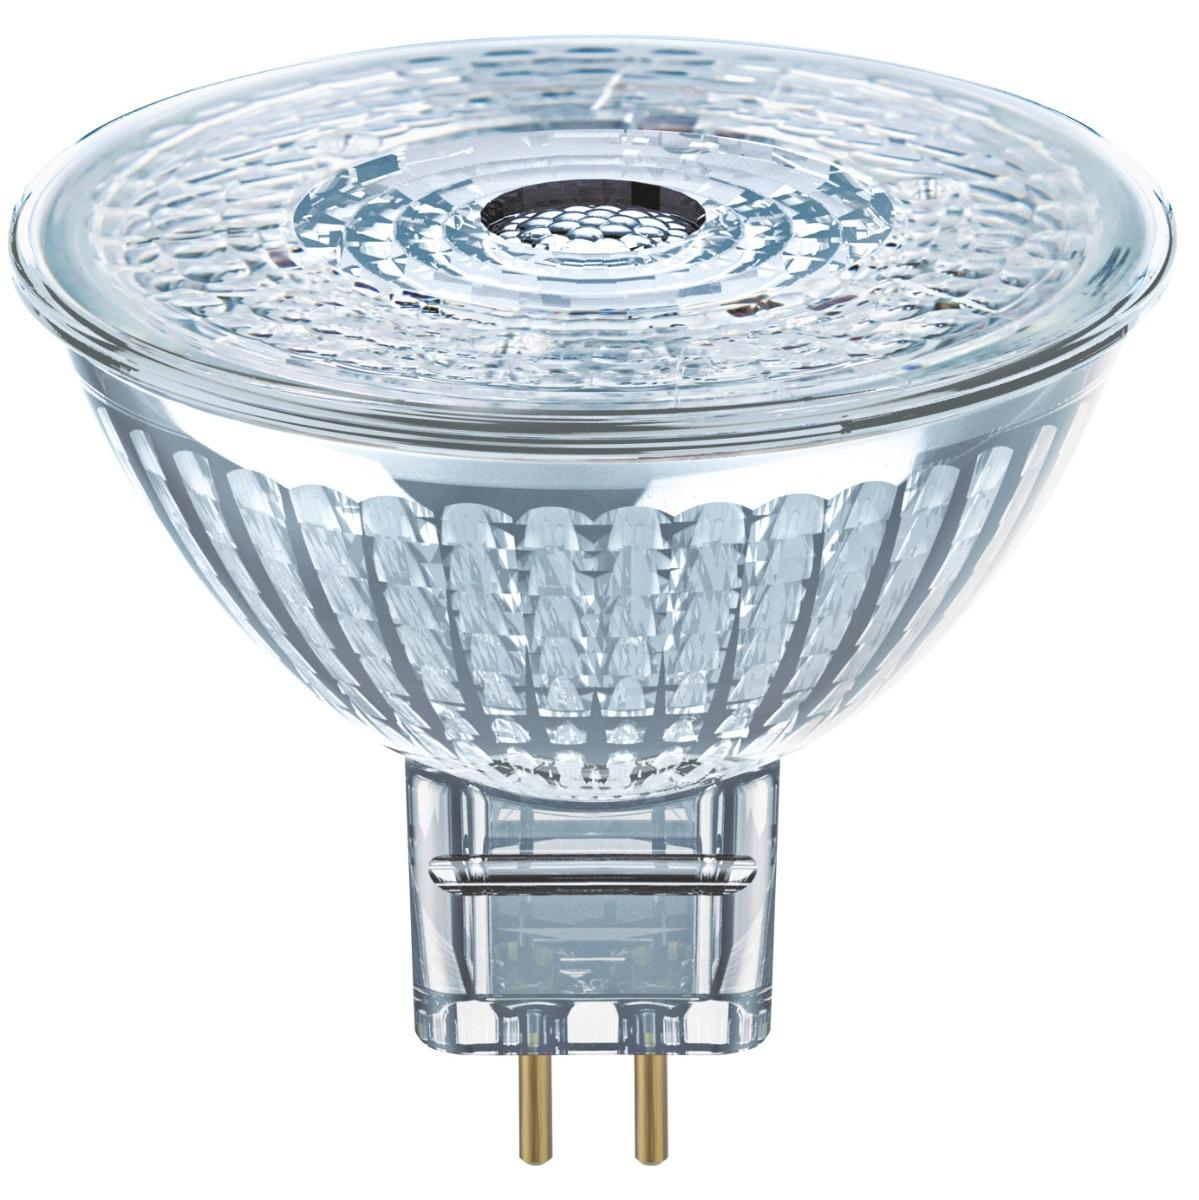 LED žárovka LED GU5.3 MR16 2,6W = 20W 230lm 4000K Neutrální bílá 36° 12V OSRAM Parathom OSRPARE0016